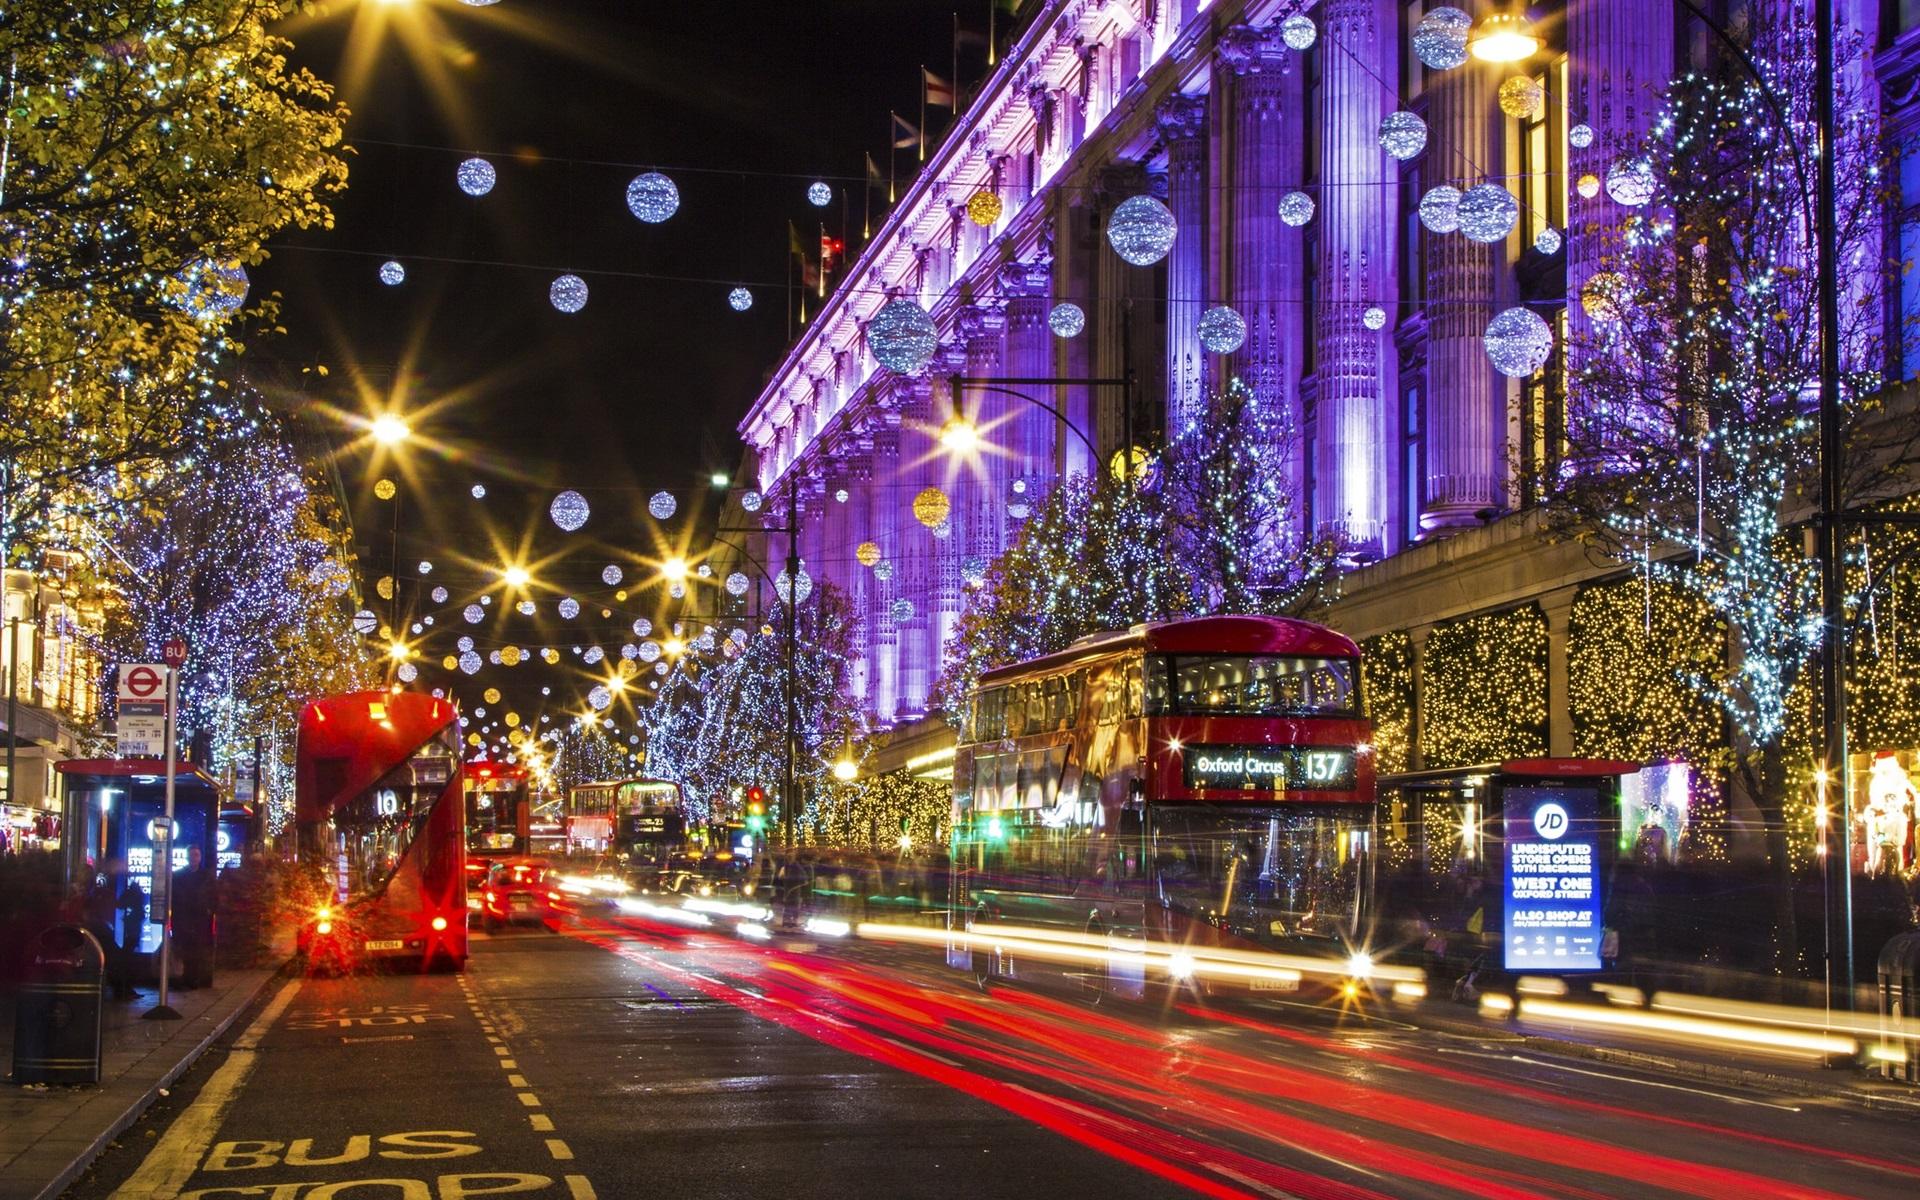 wallpaper london, england, city street, christmas, holiday lights